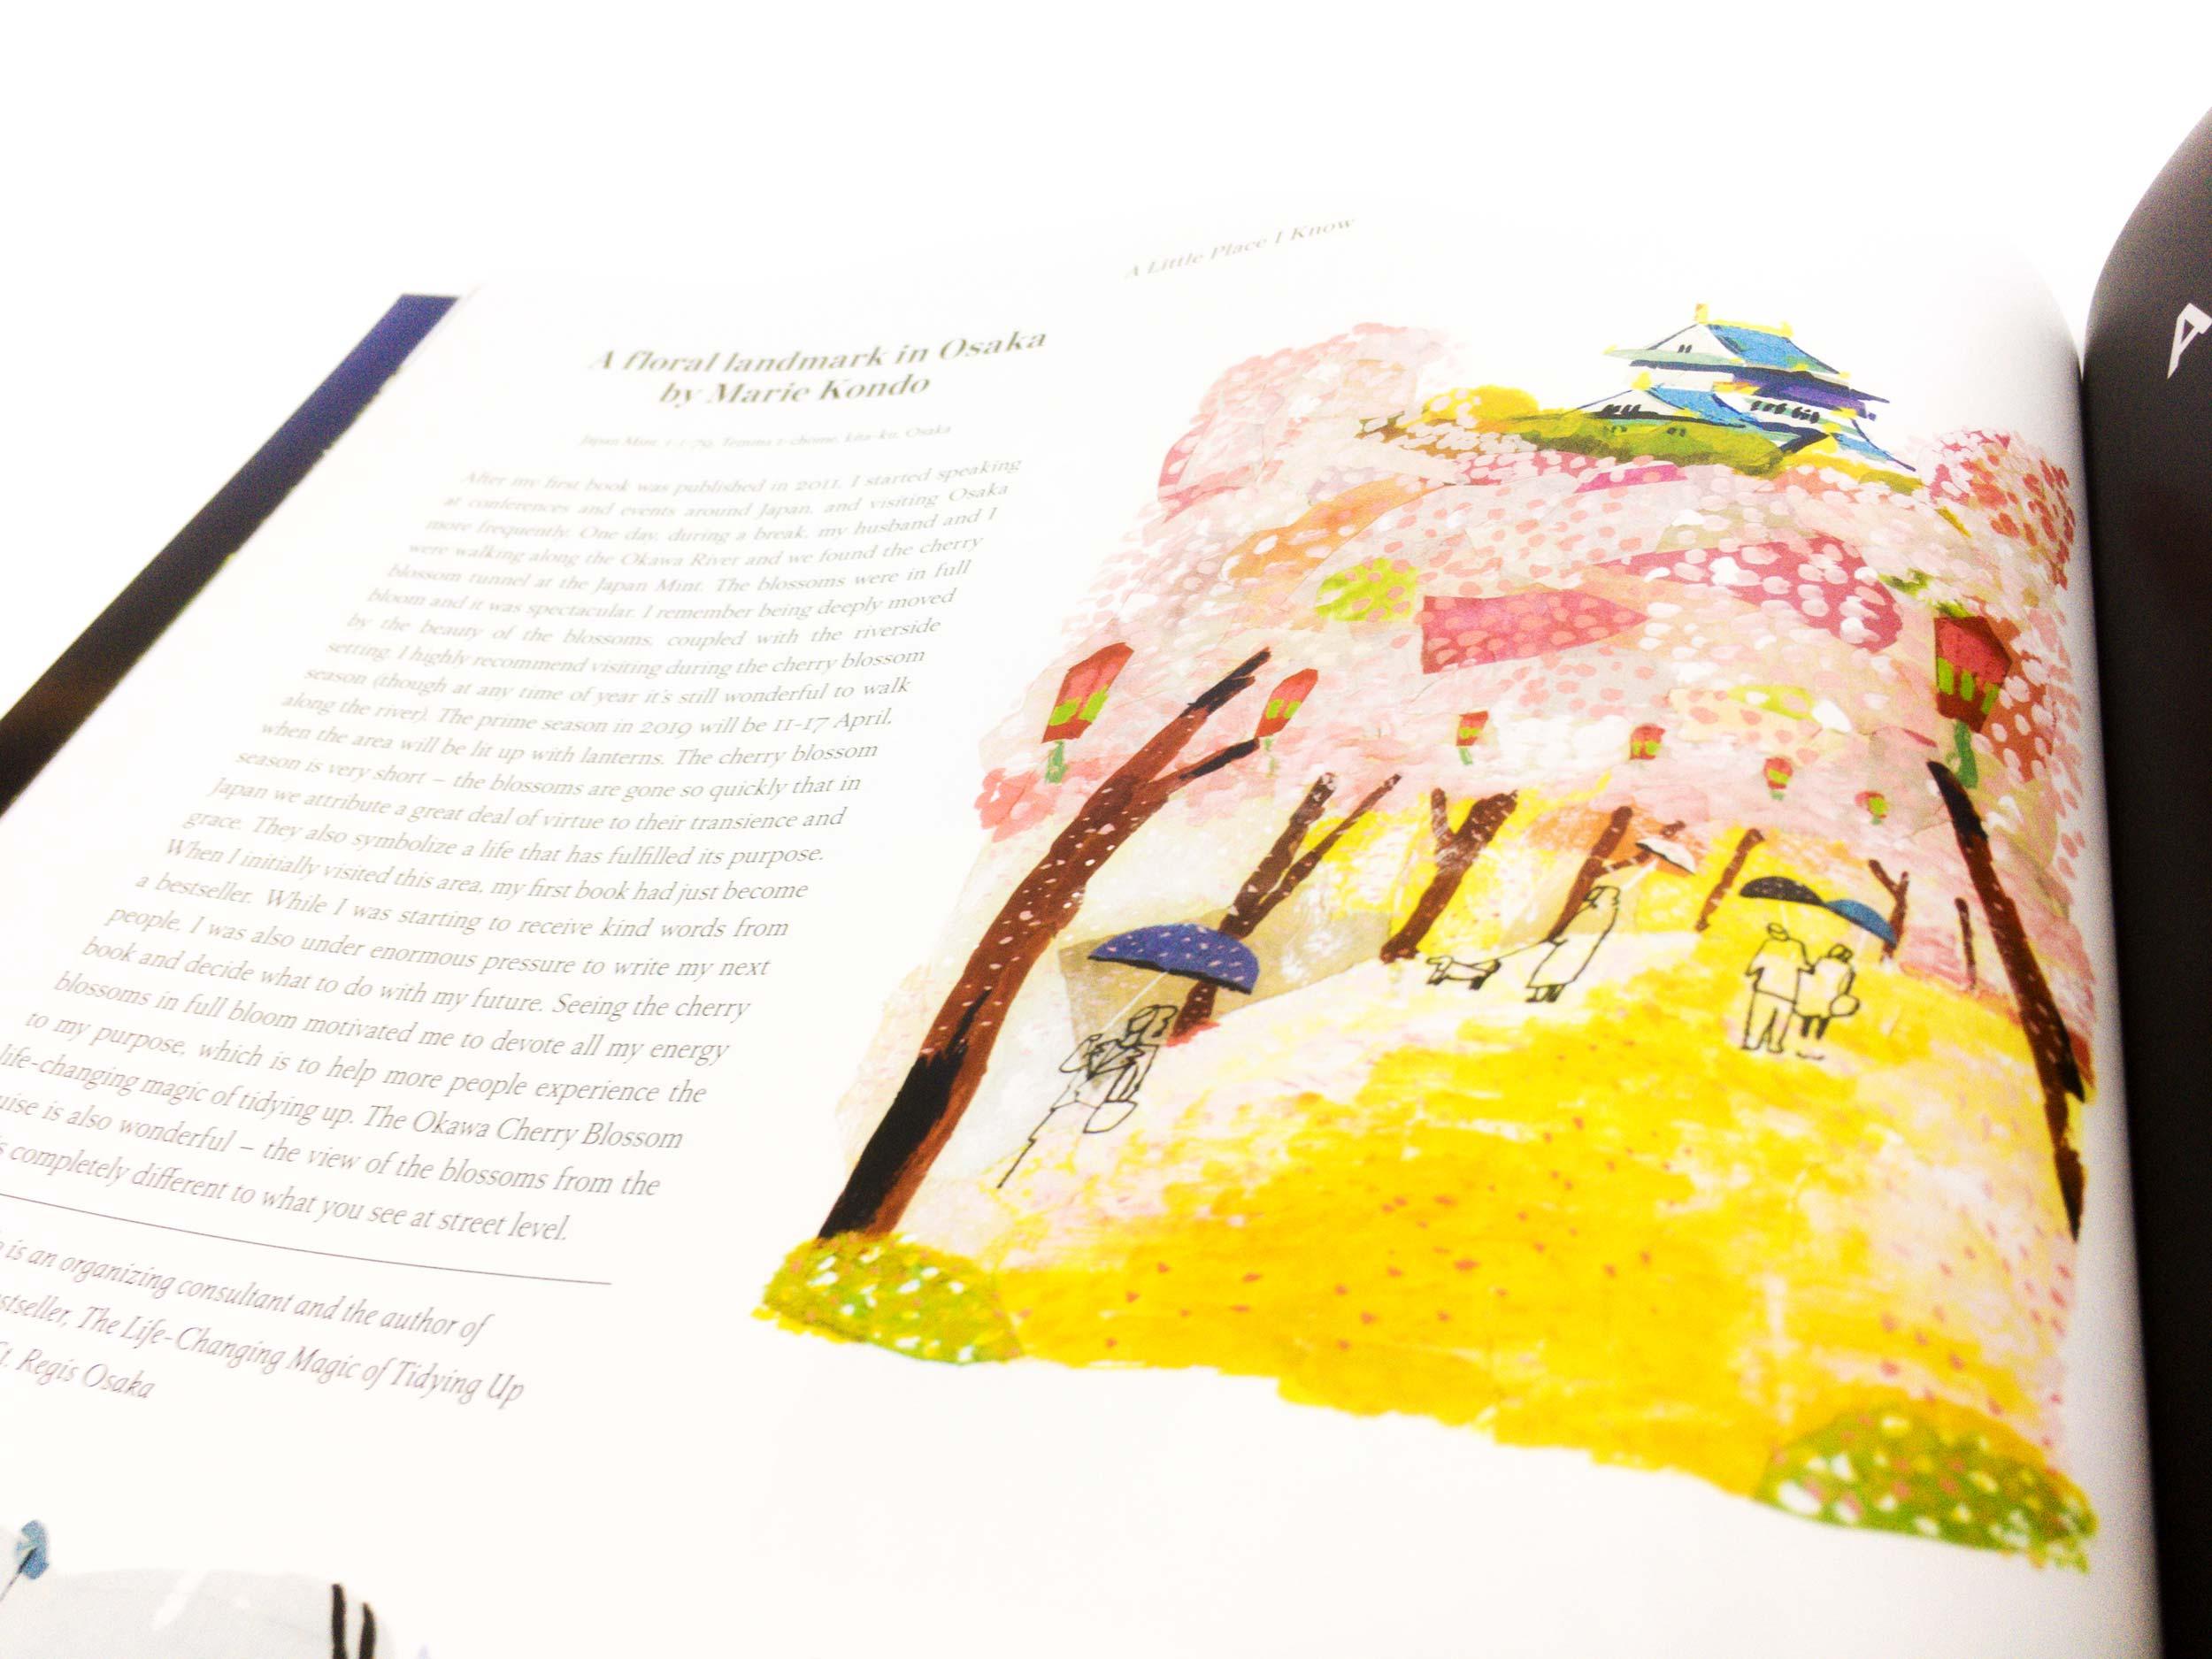 St Regis Beyond illustrations by James Oses, image 6